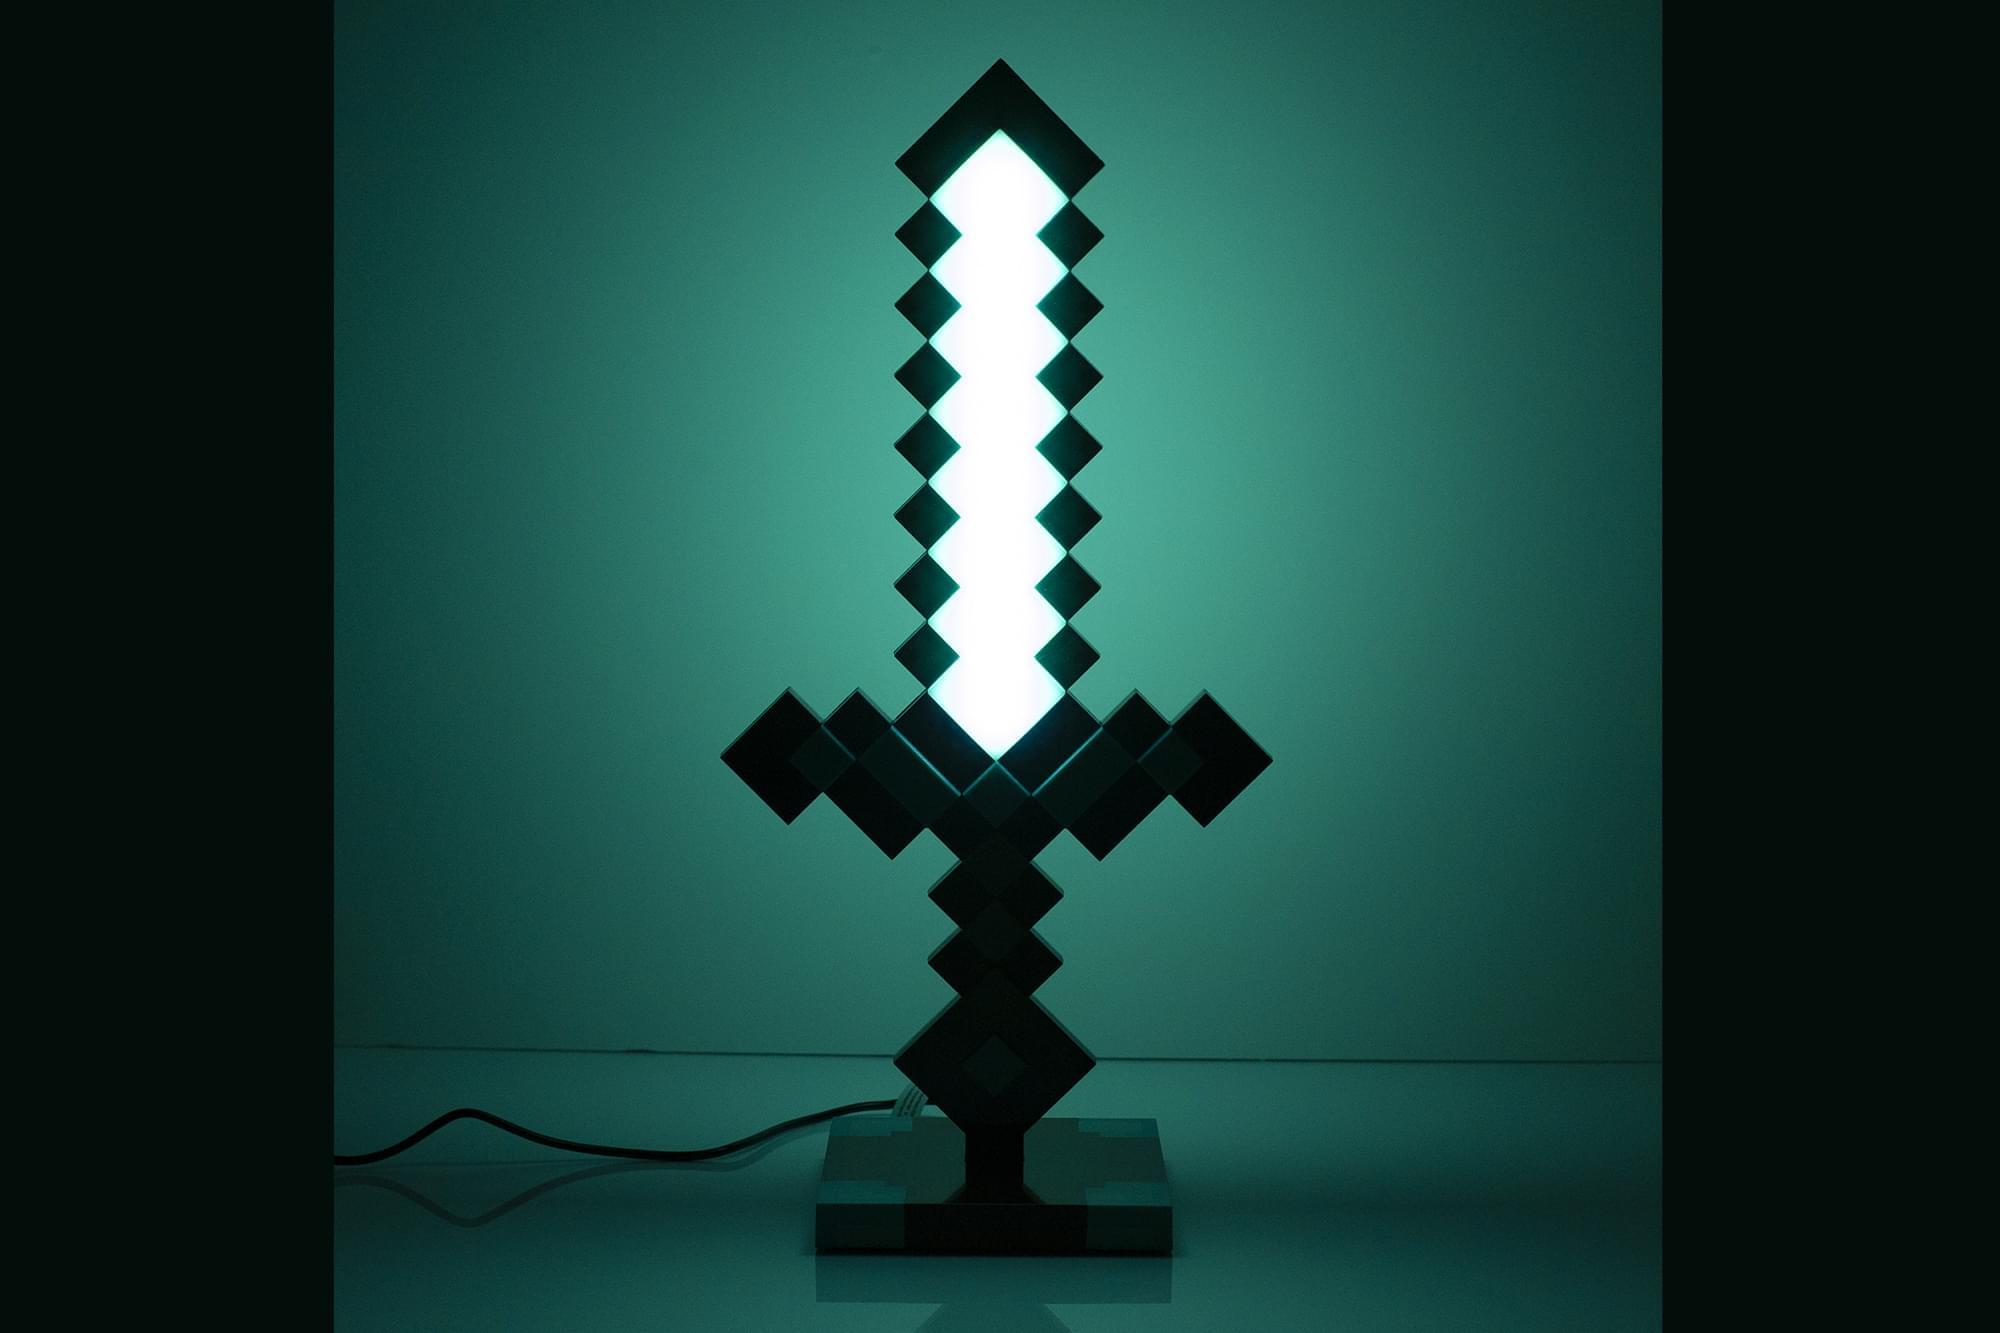 Minecraft Diamond Sword Desk Lamp ($49)